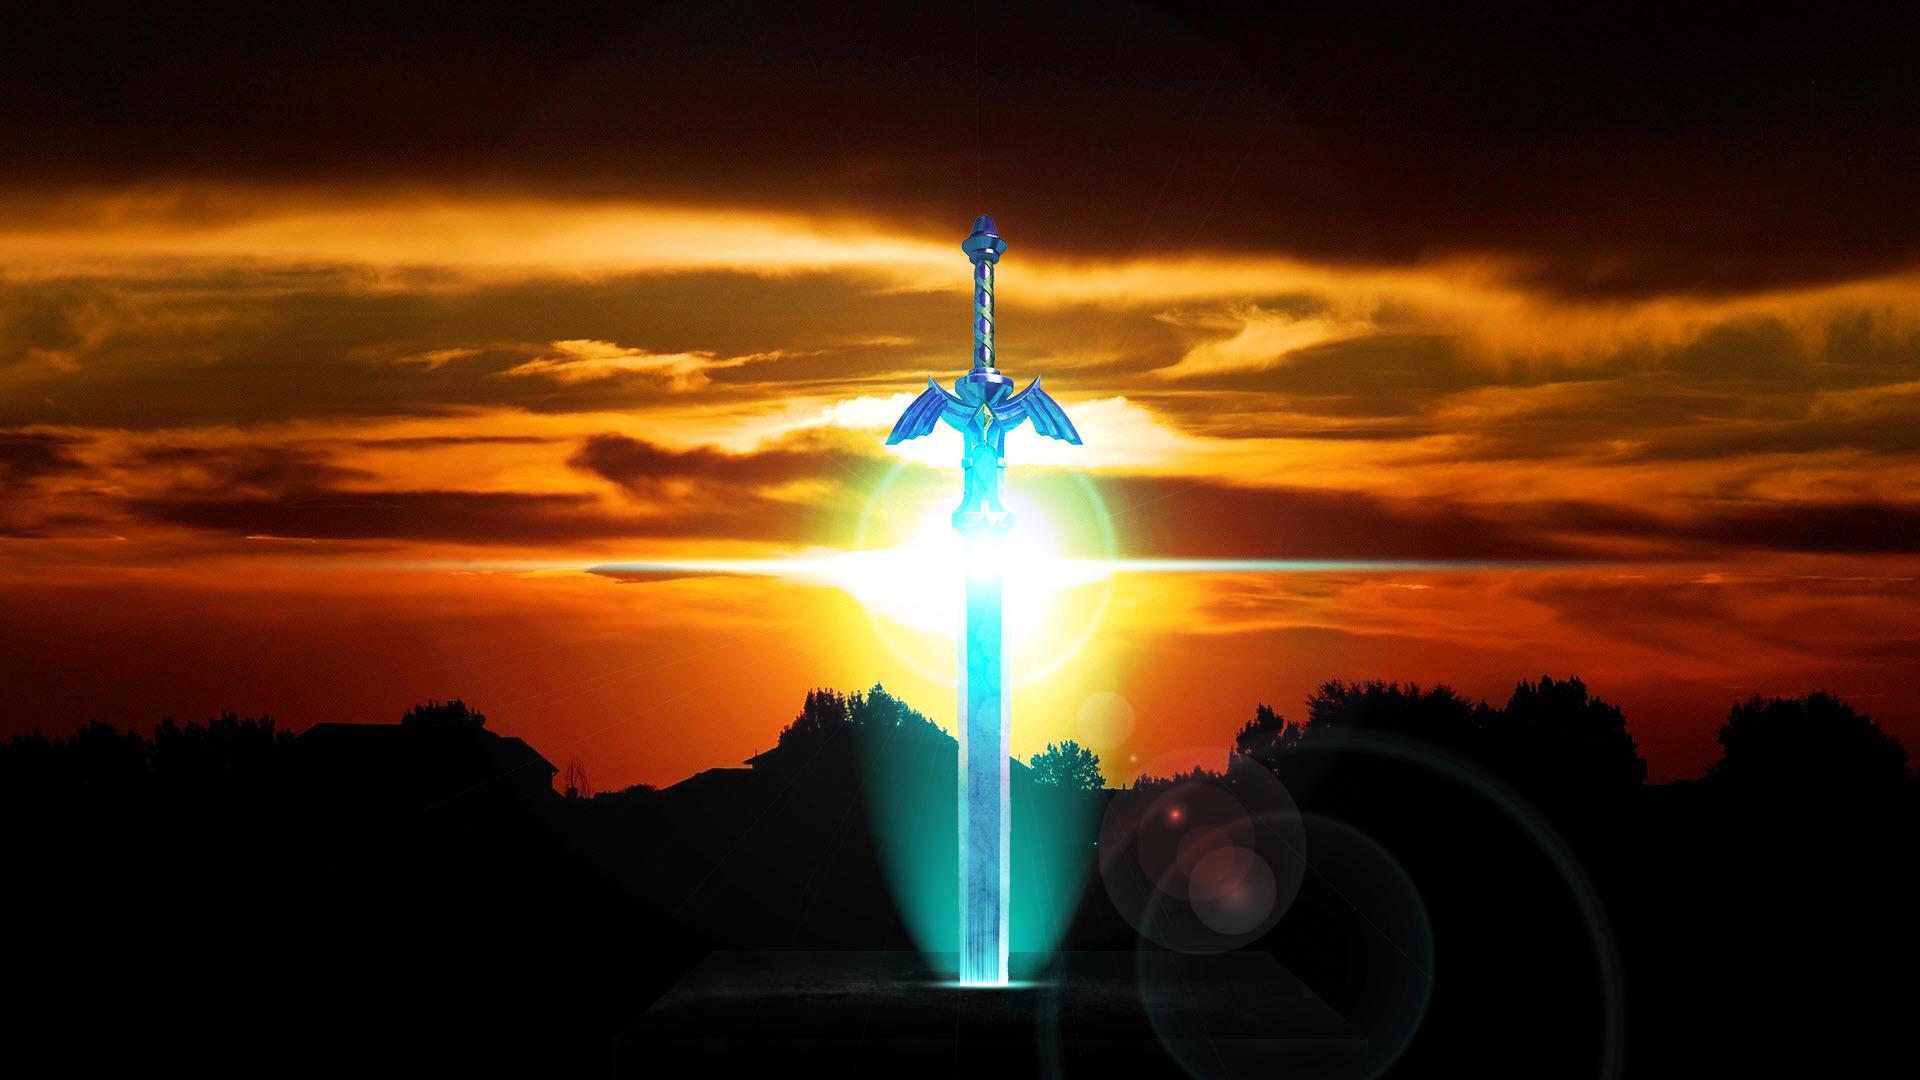 Master Sword Spazzygamergirl request Wallpaper by Hardii 1920x1080